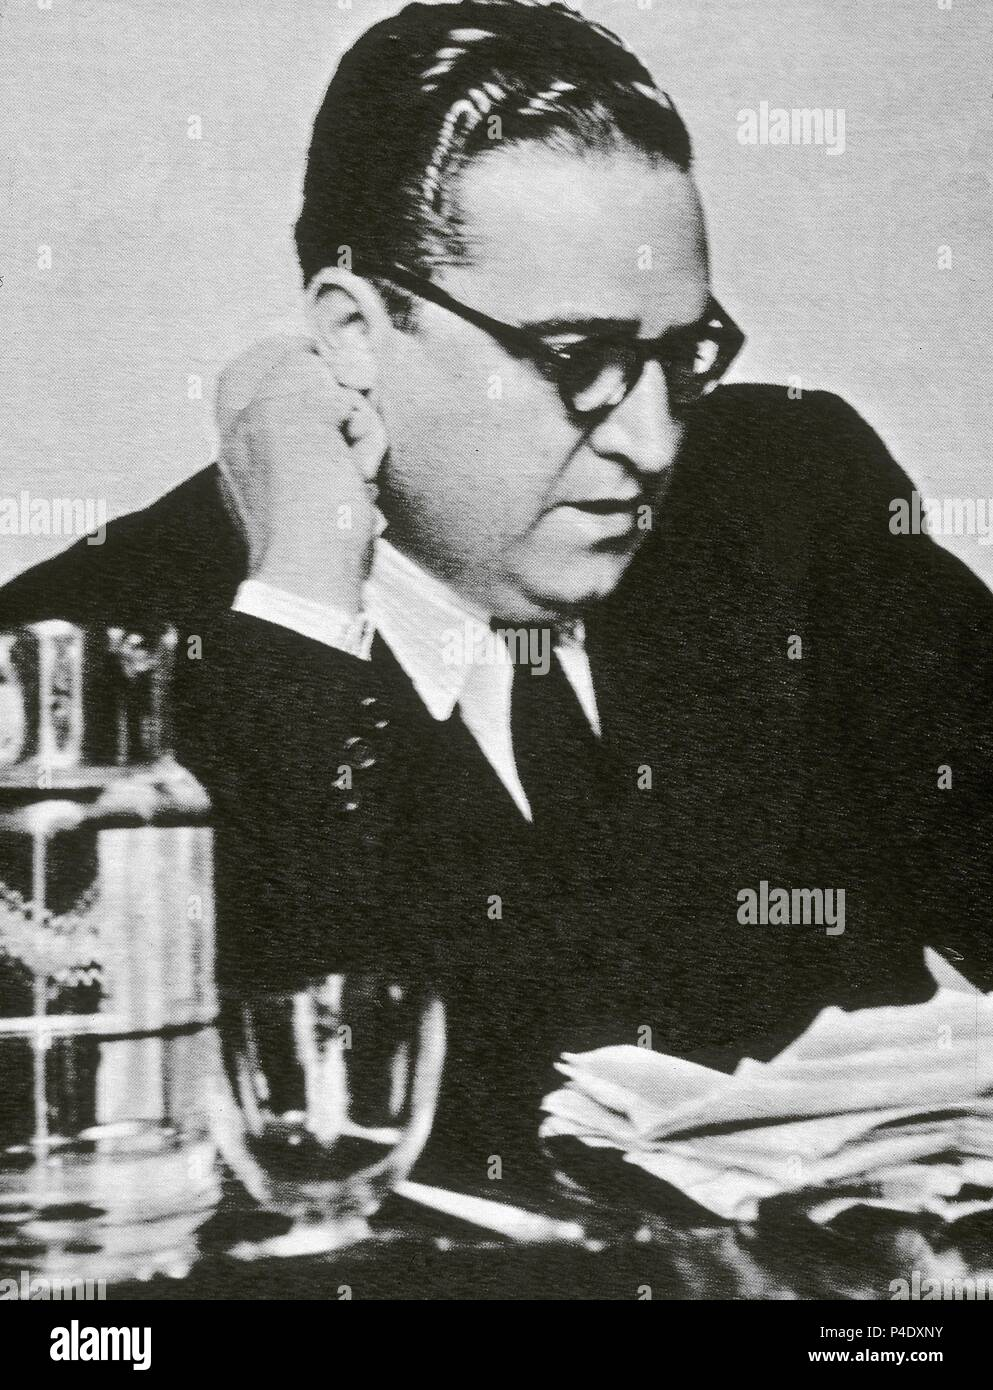 AGUSTIN DE FOXA (1906-1959) POETA NOVELISTA PERIODISTA Y DIPLOMATICO ESPAÑOL. Stock Photo